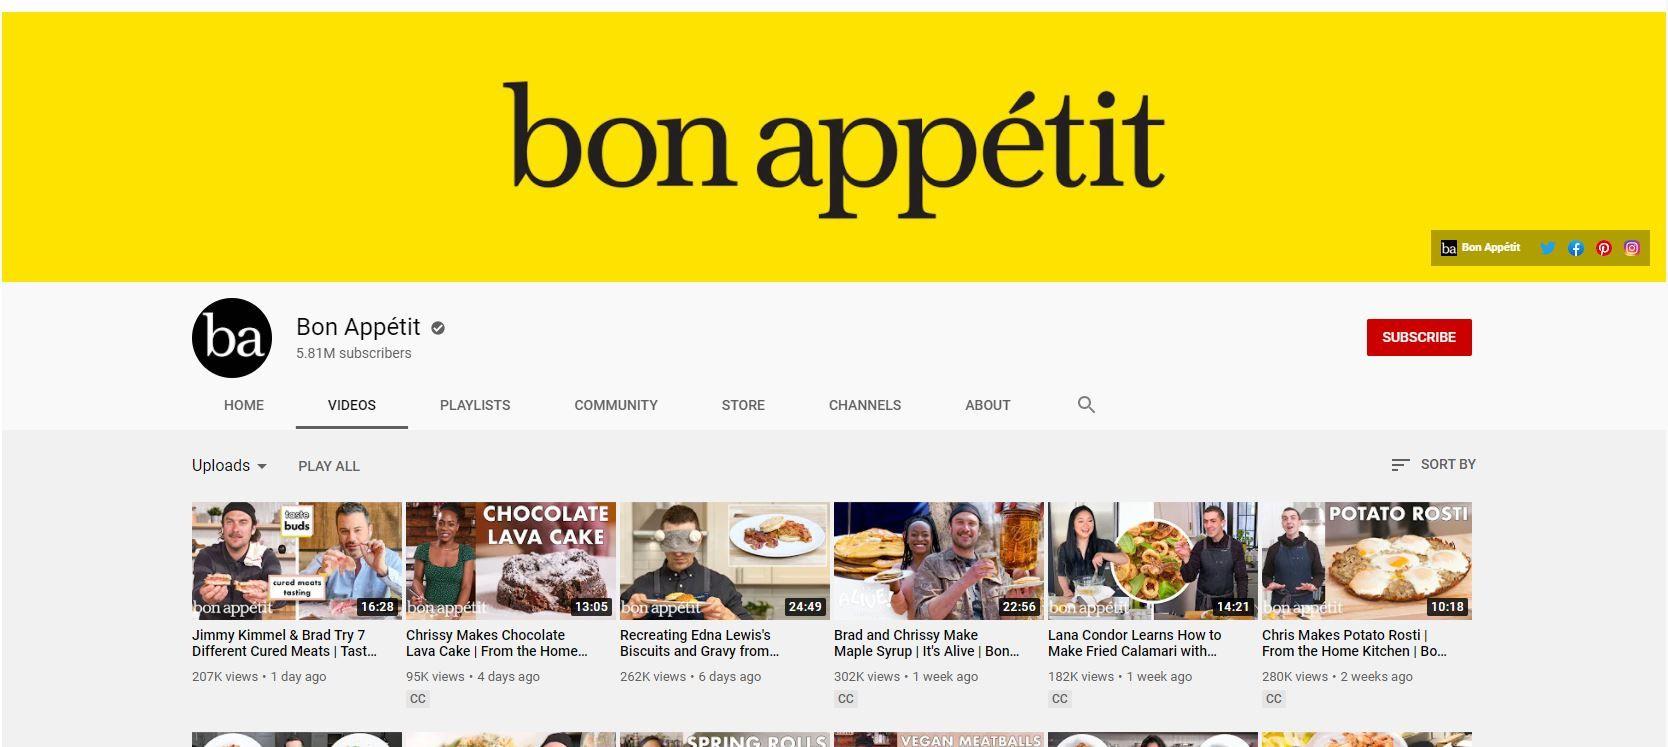 youtube channel bon appetit